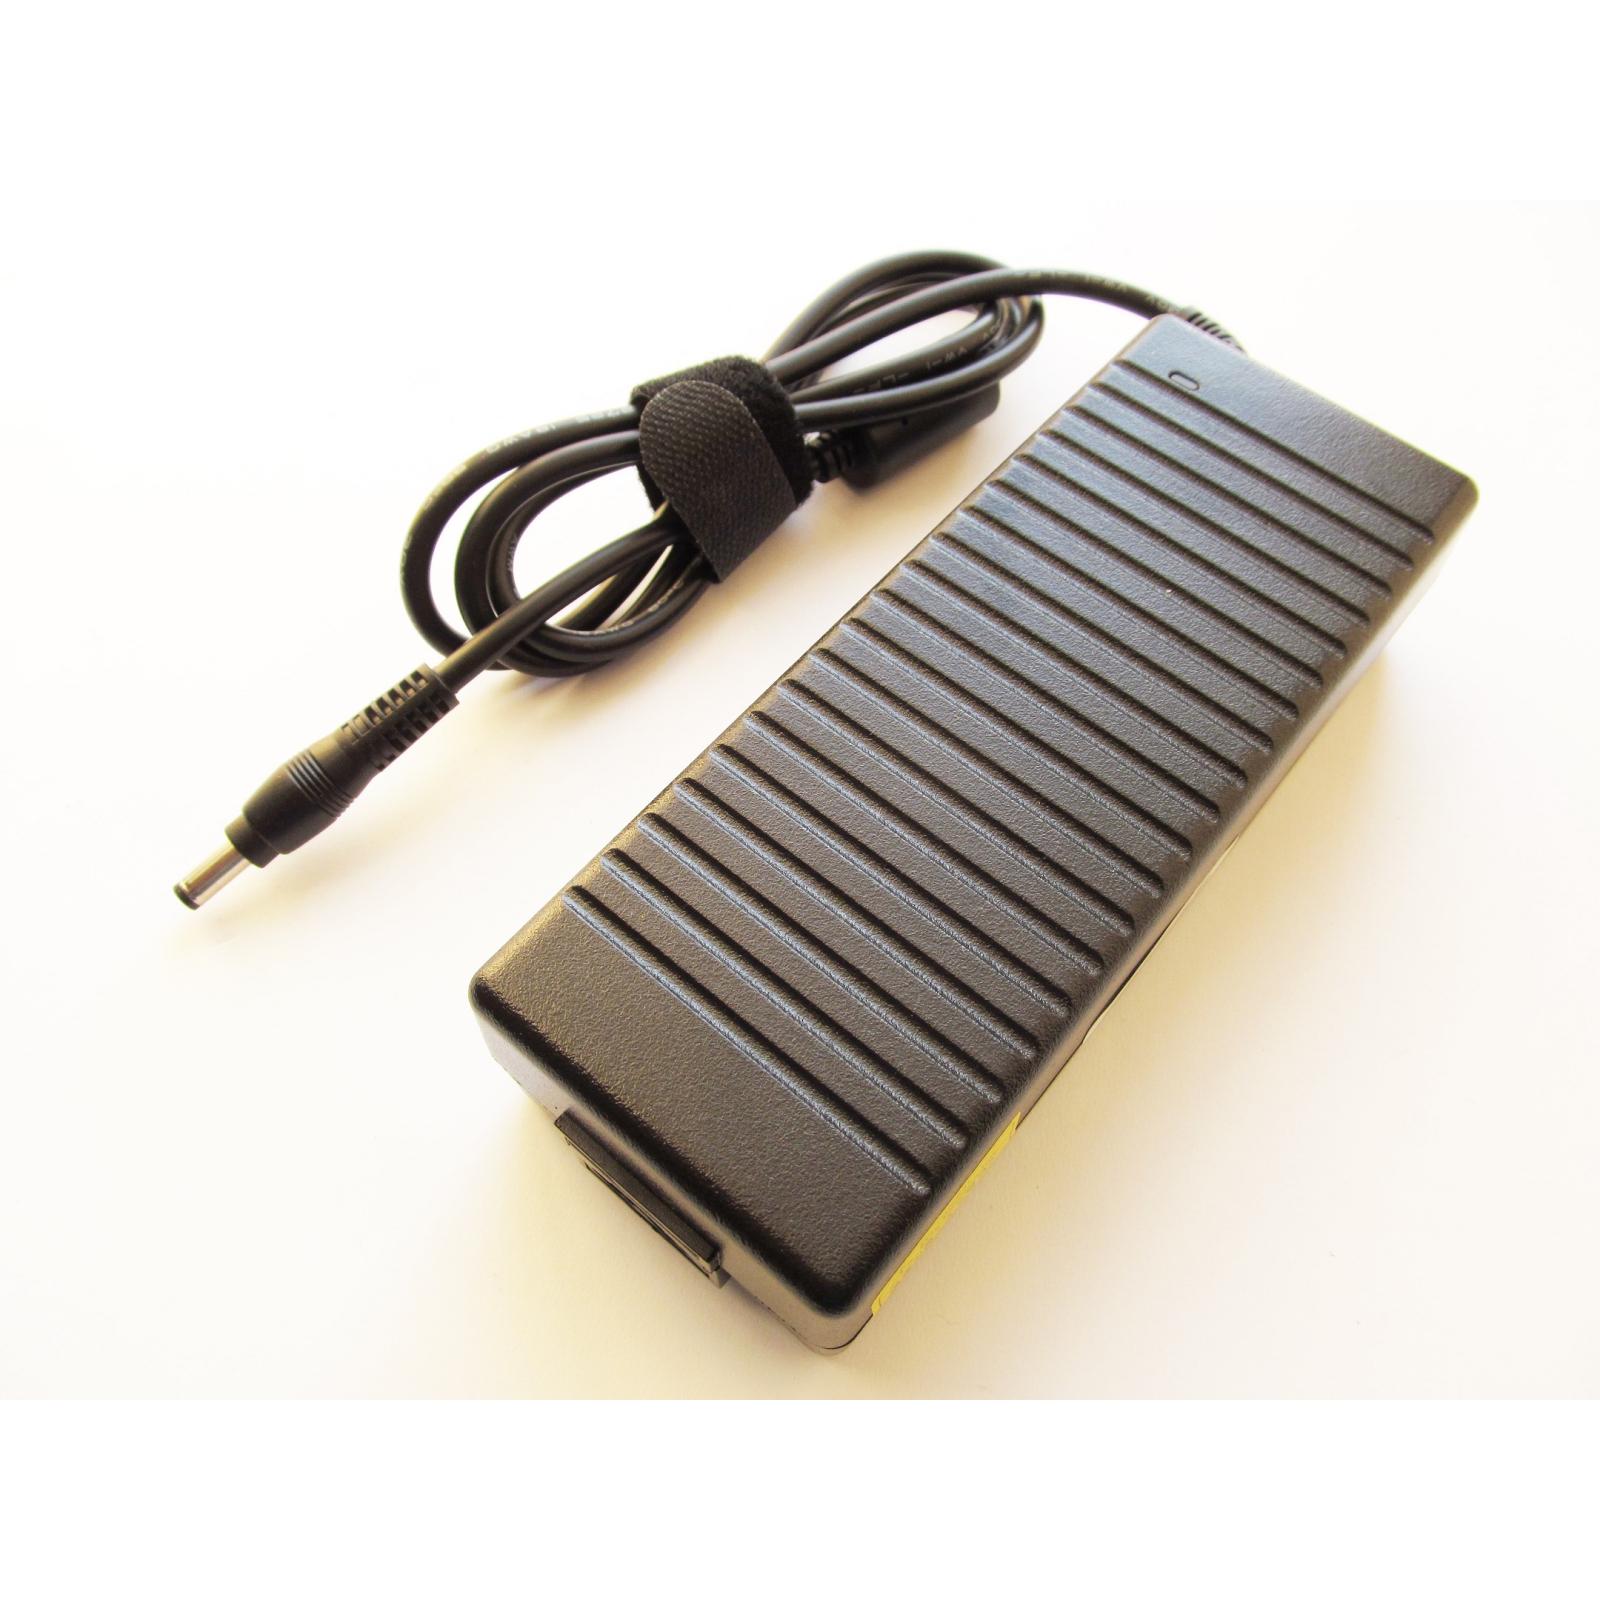 Блок питания к ноутбуку ASUS 120W 19V, 6.32A, разъем 5.5/2.5 (PA-1121-04 / A40267) изображение 2